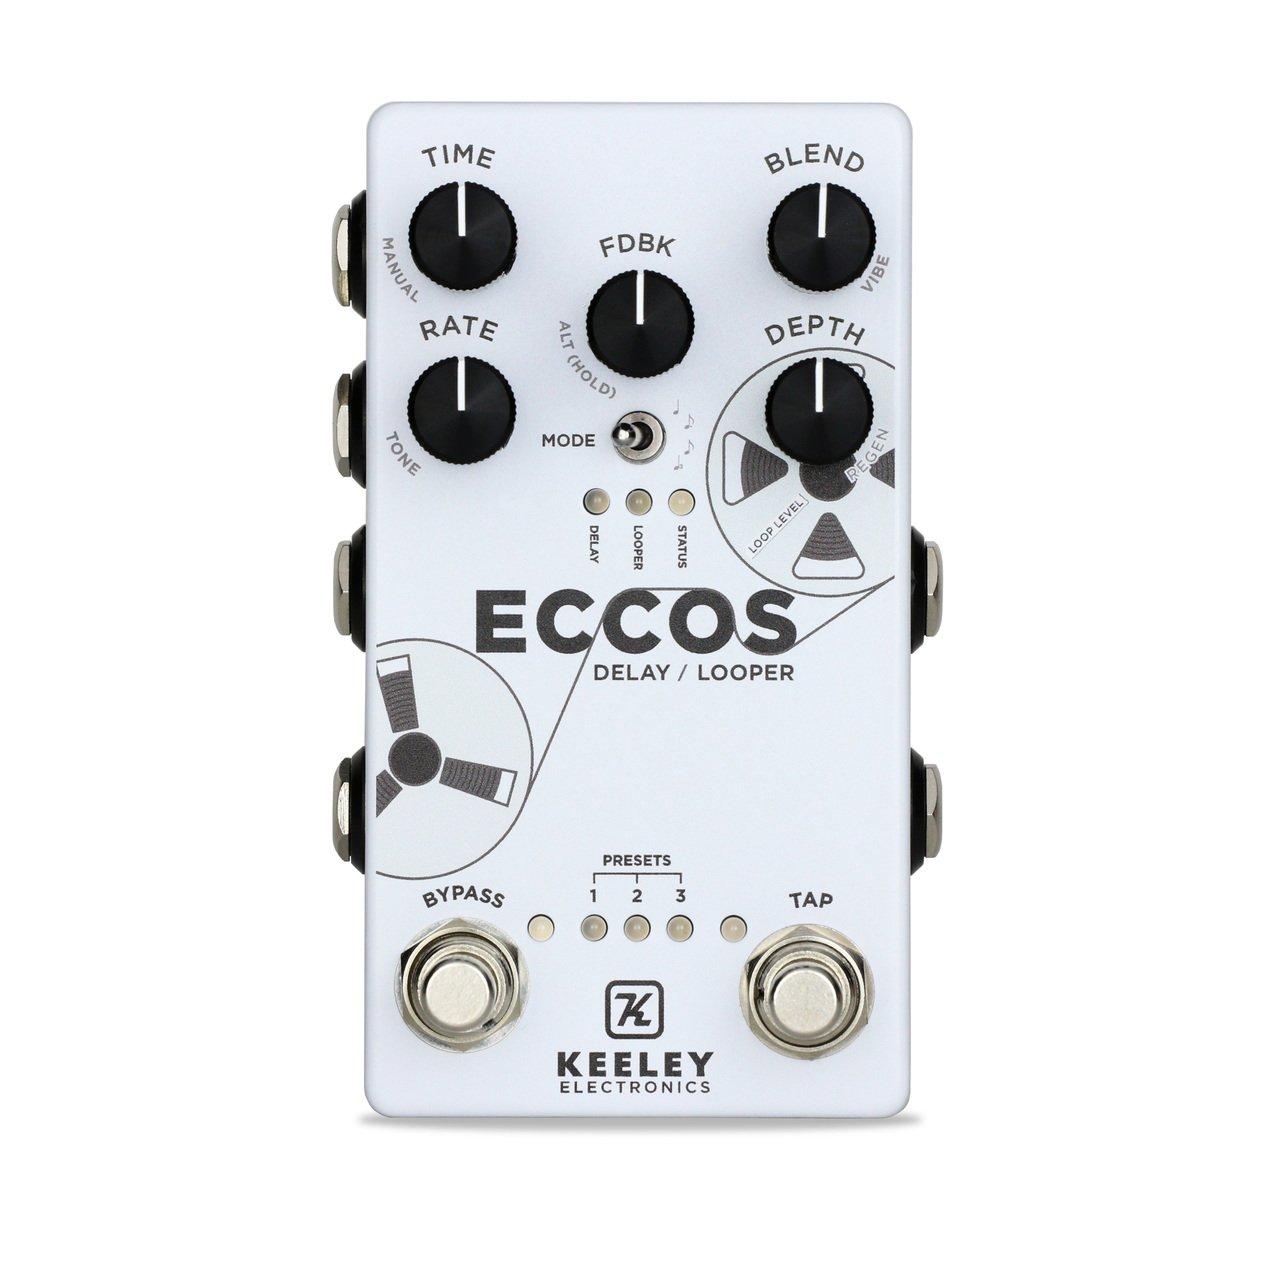 Keeley ECCOS Neo-Vintage Tape Delay and Looper Pedal